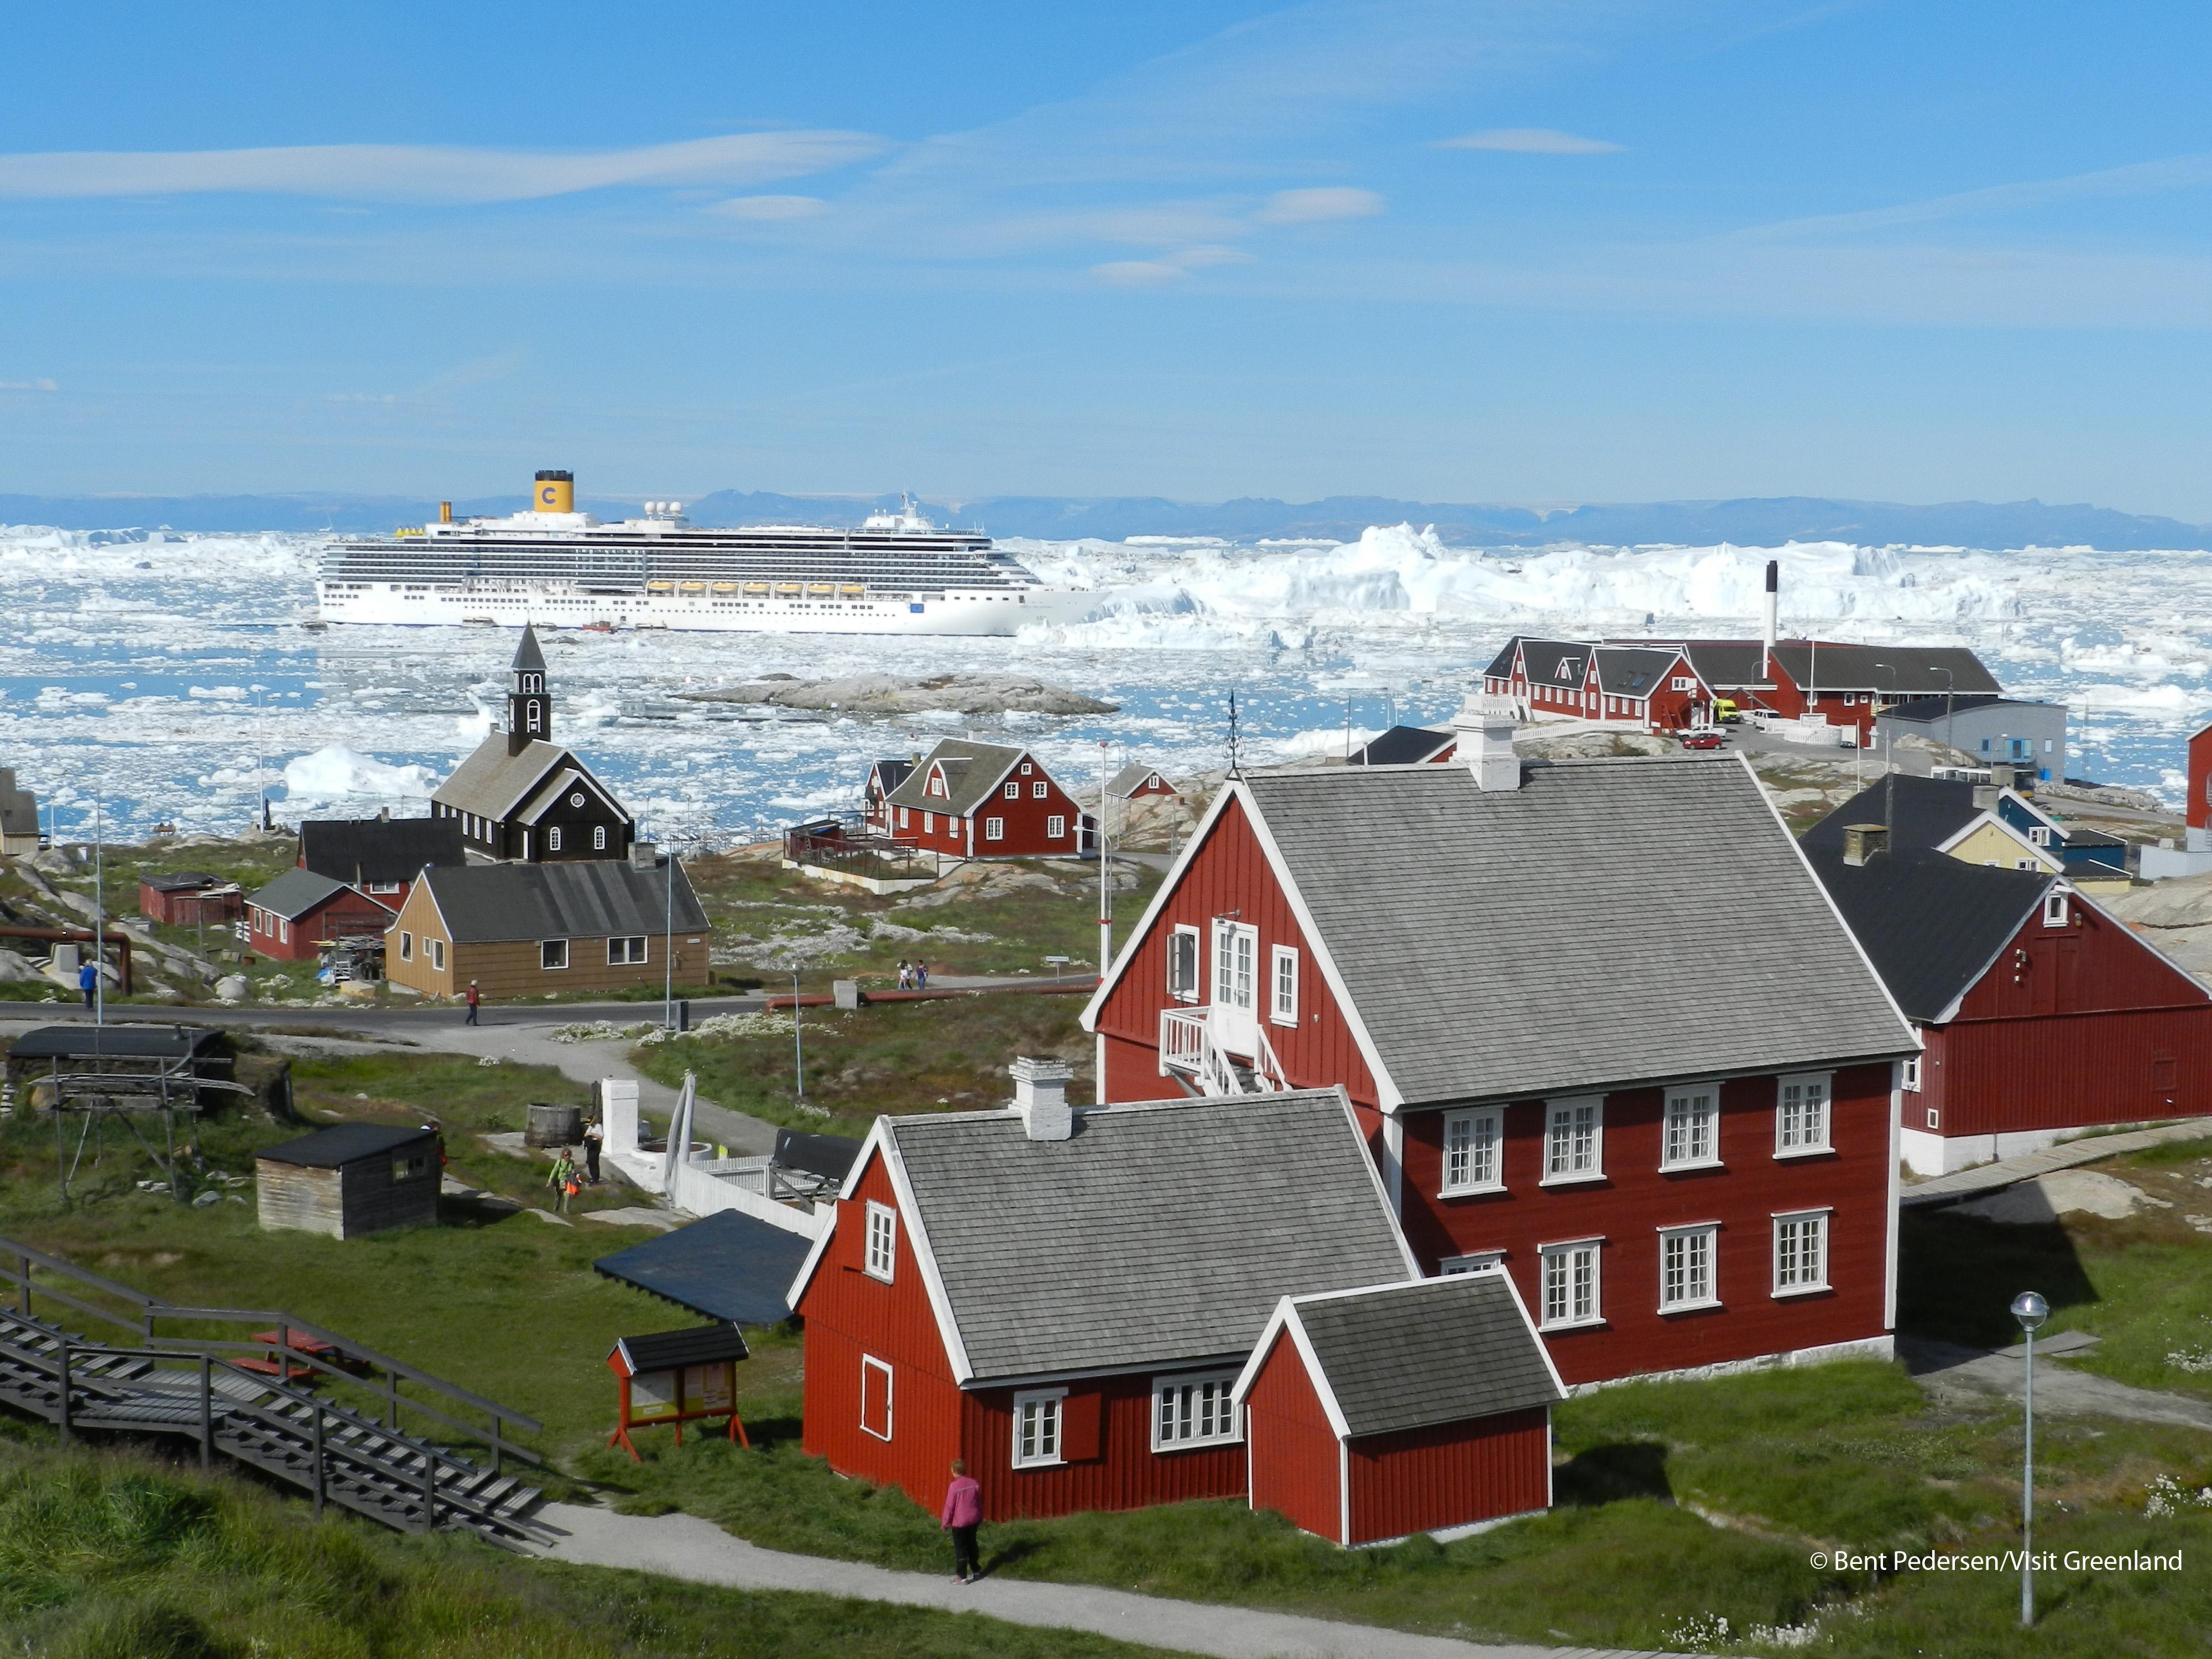 Greenland Winter Tours